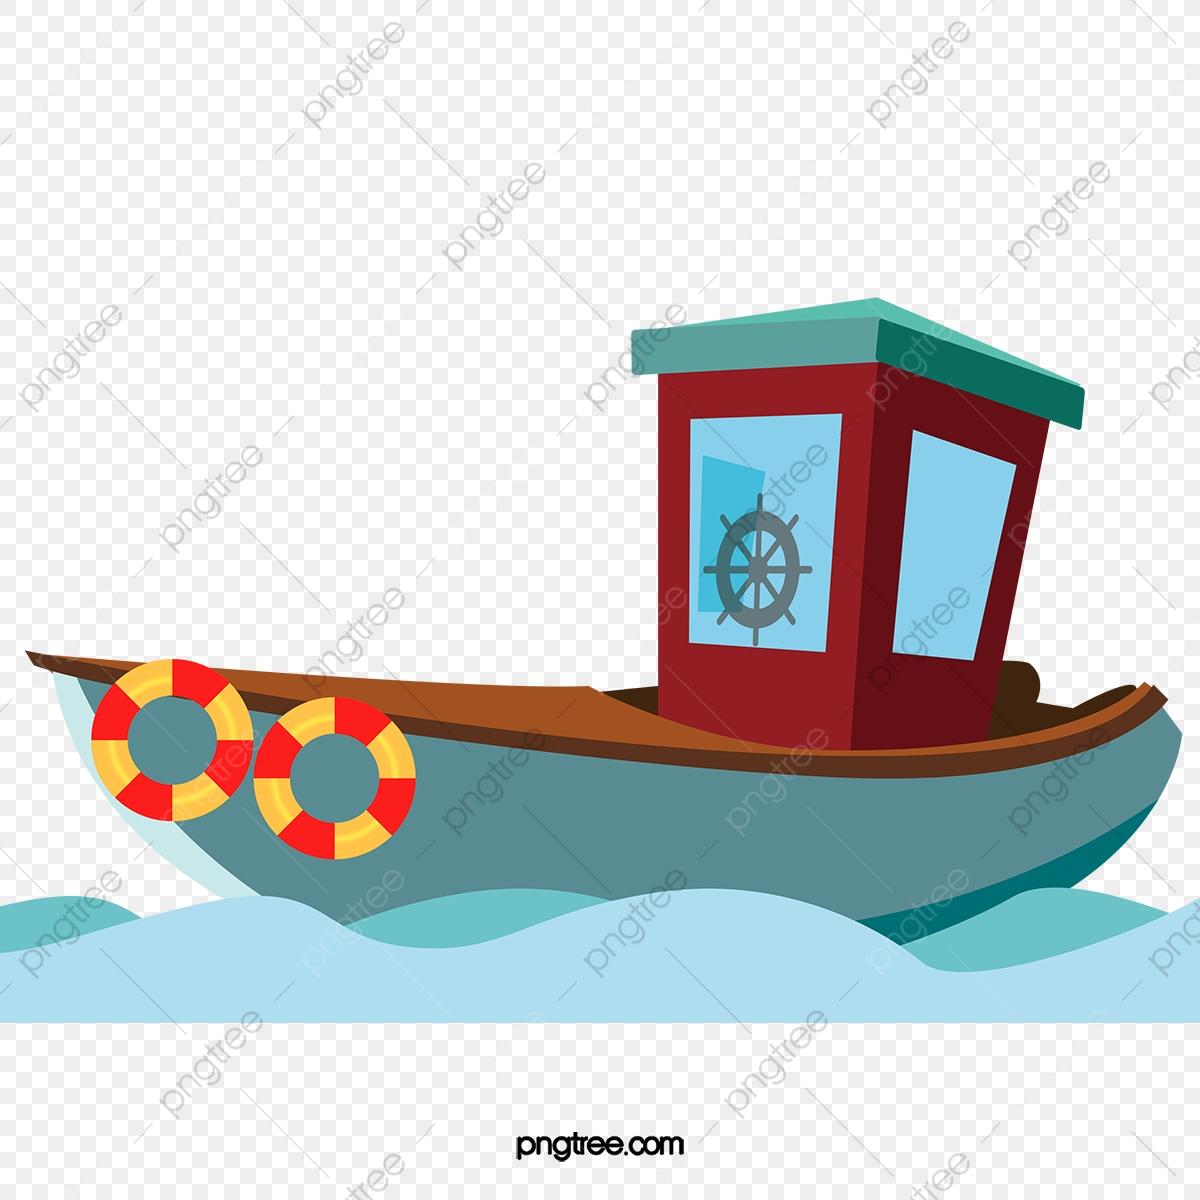 Boats clipart vector. Fisherman fishing boat material